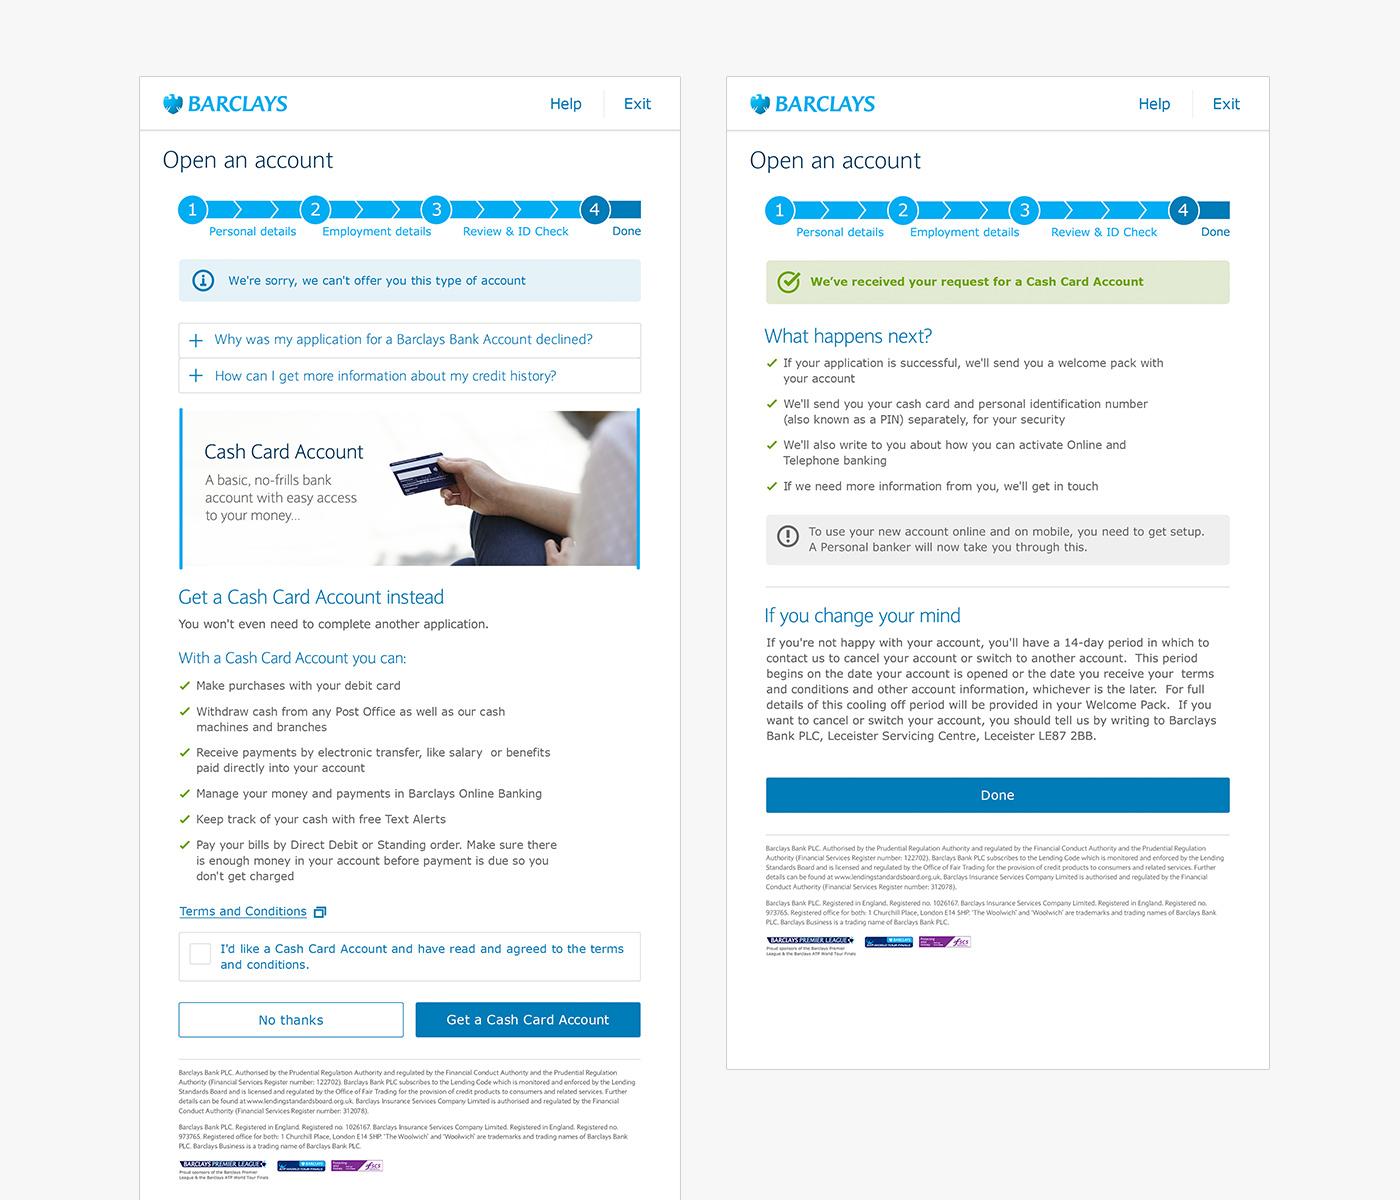 Barclays Branch App